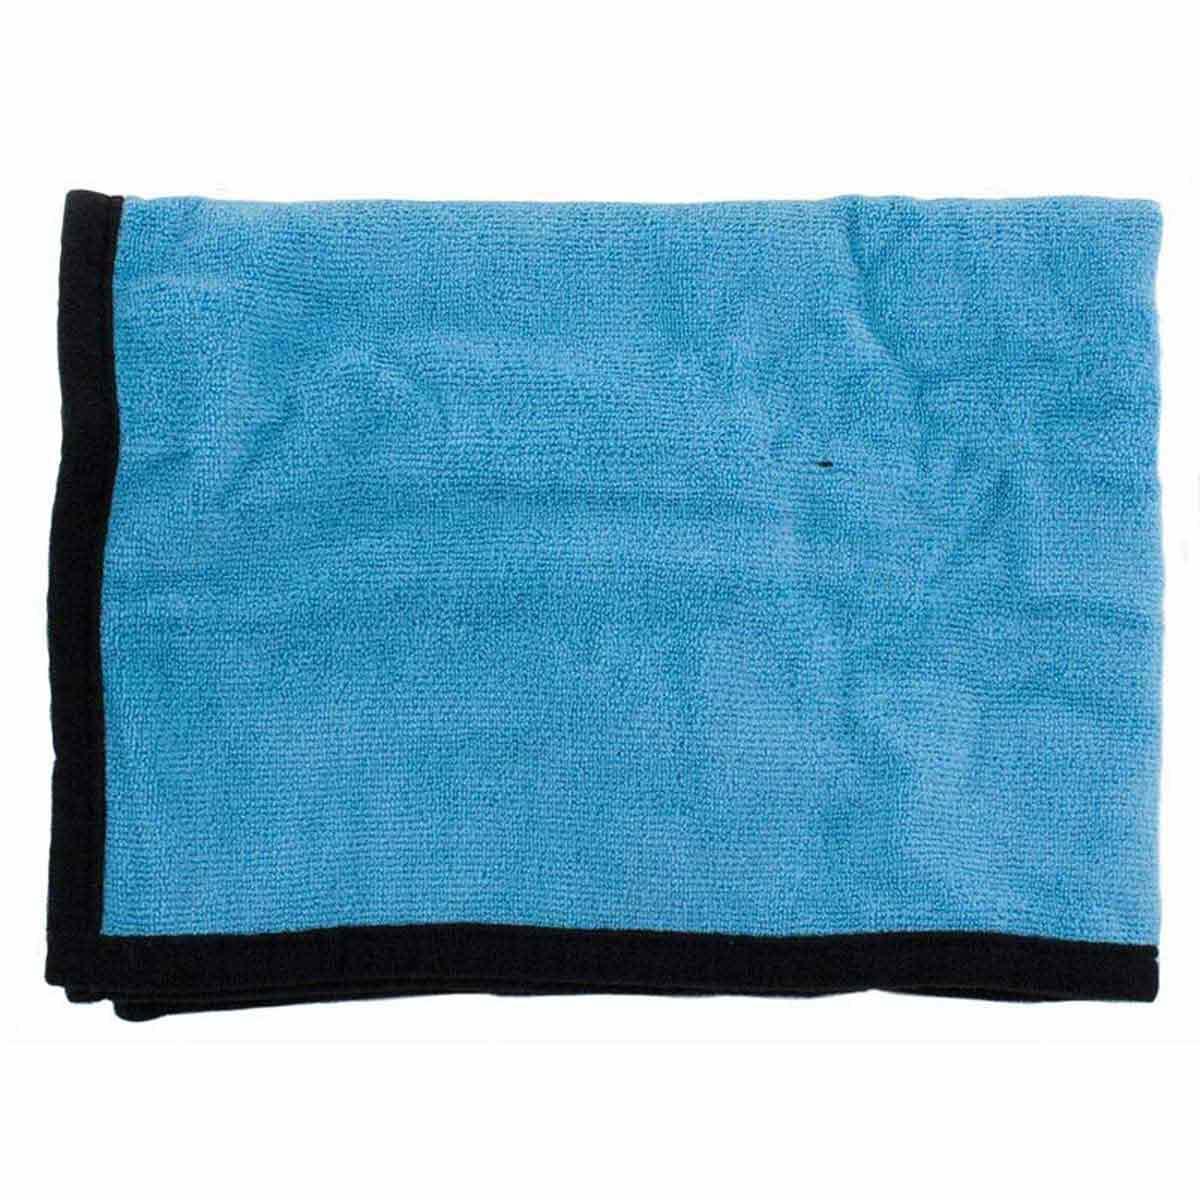 Blue Pet Head Playin' Dirty Pocket Towel 16.5 inch by 22.5 inch